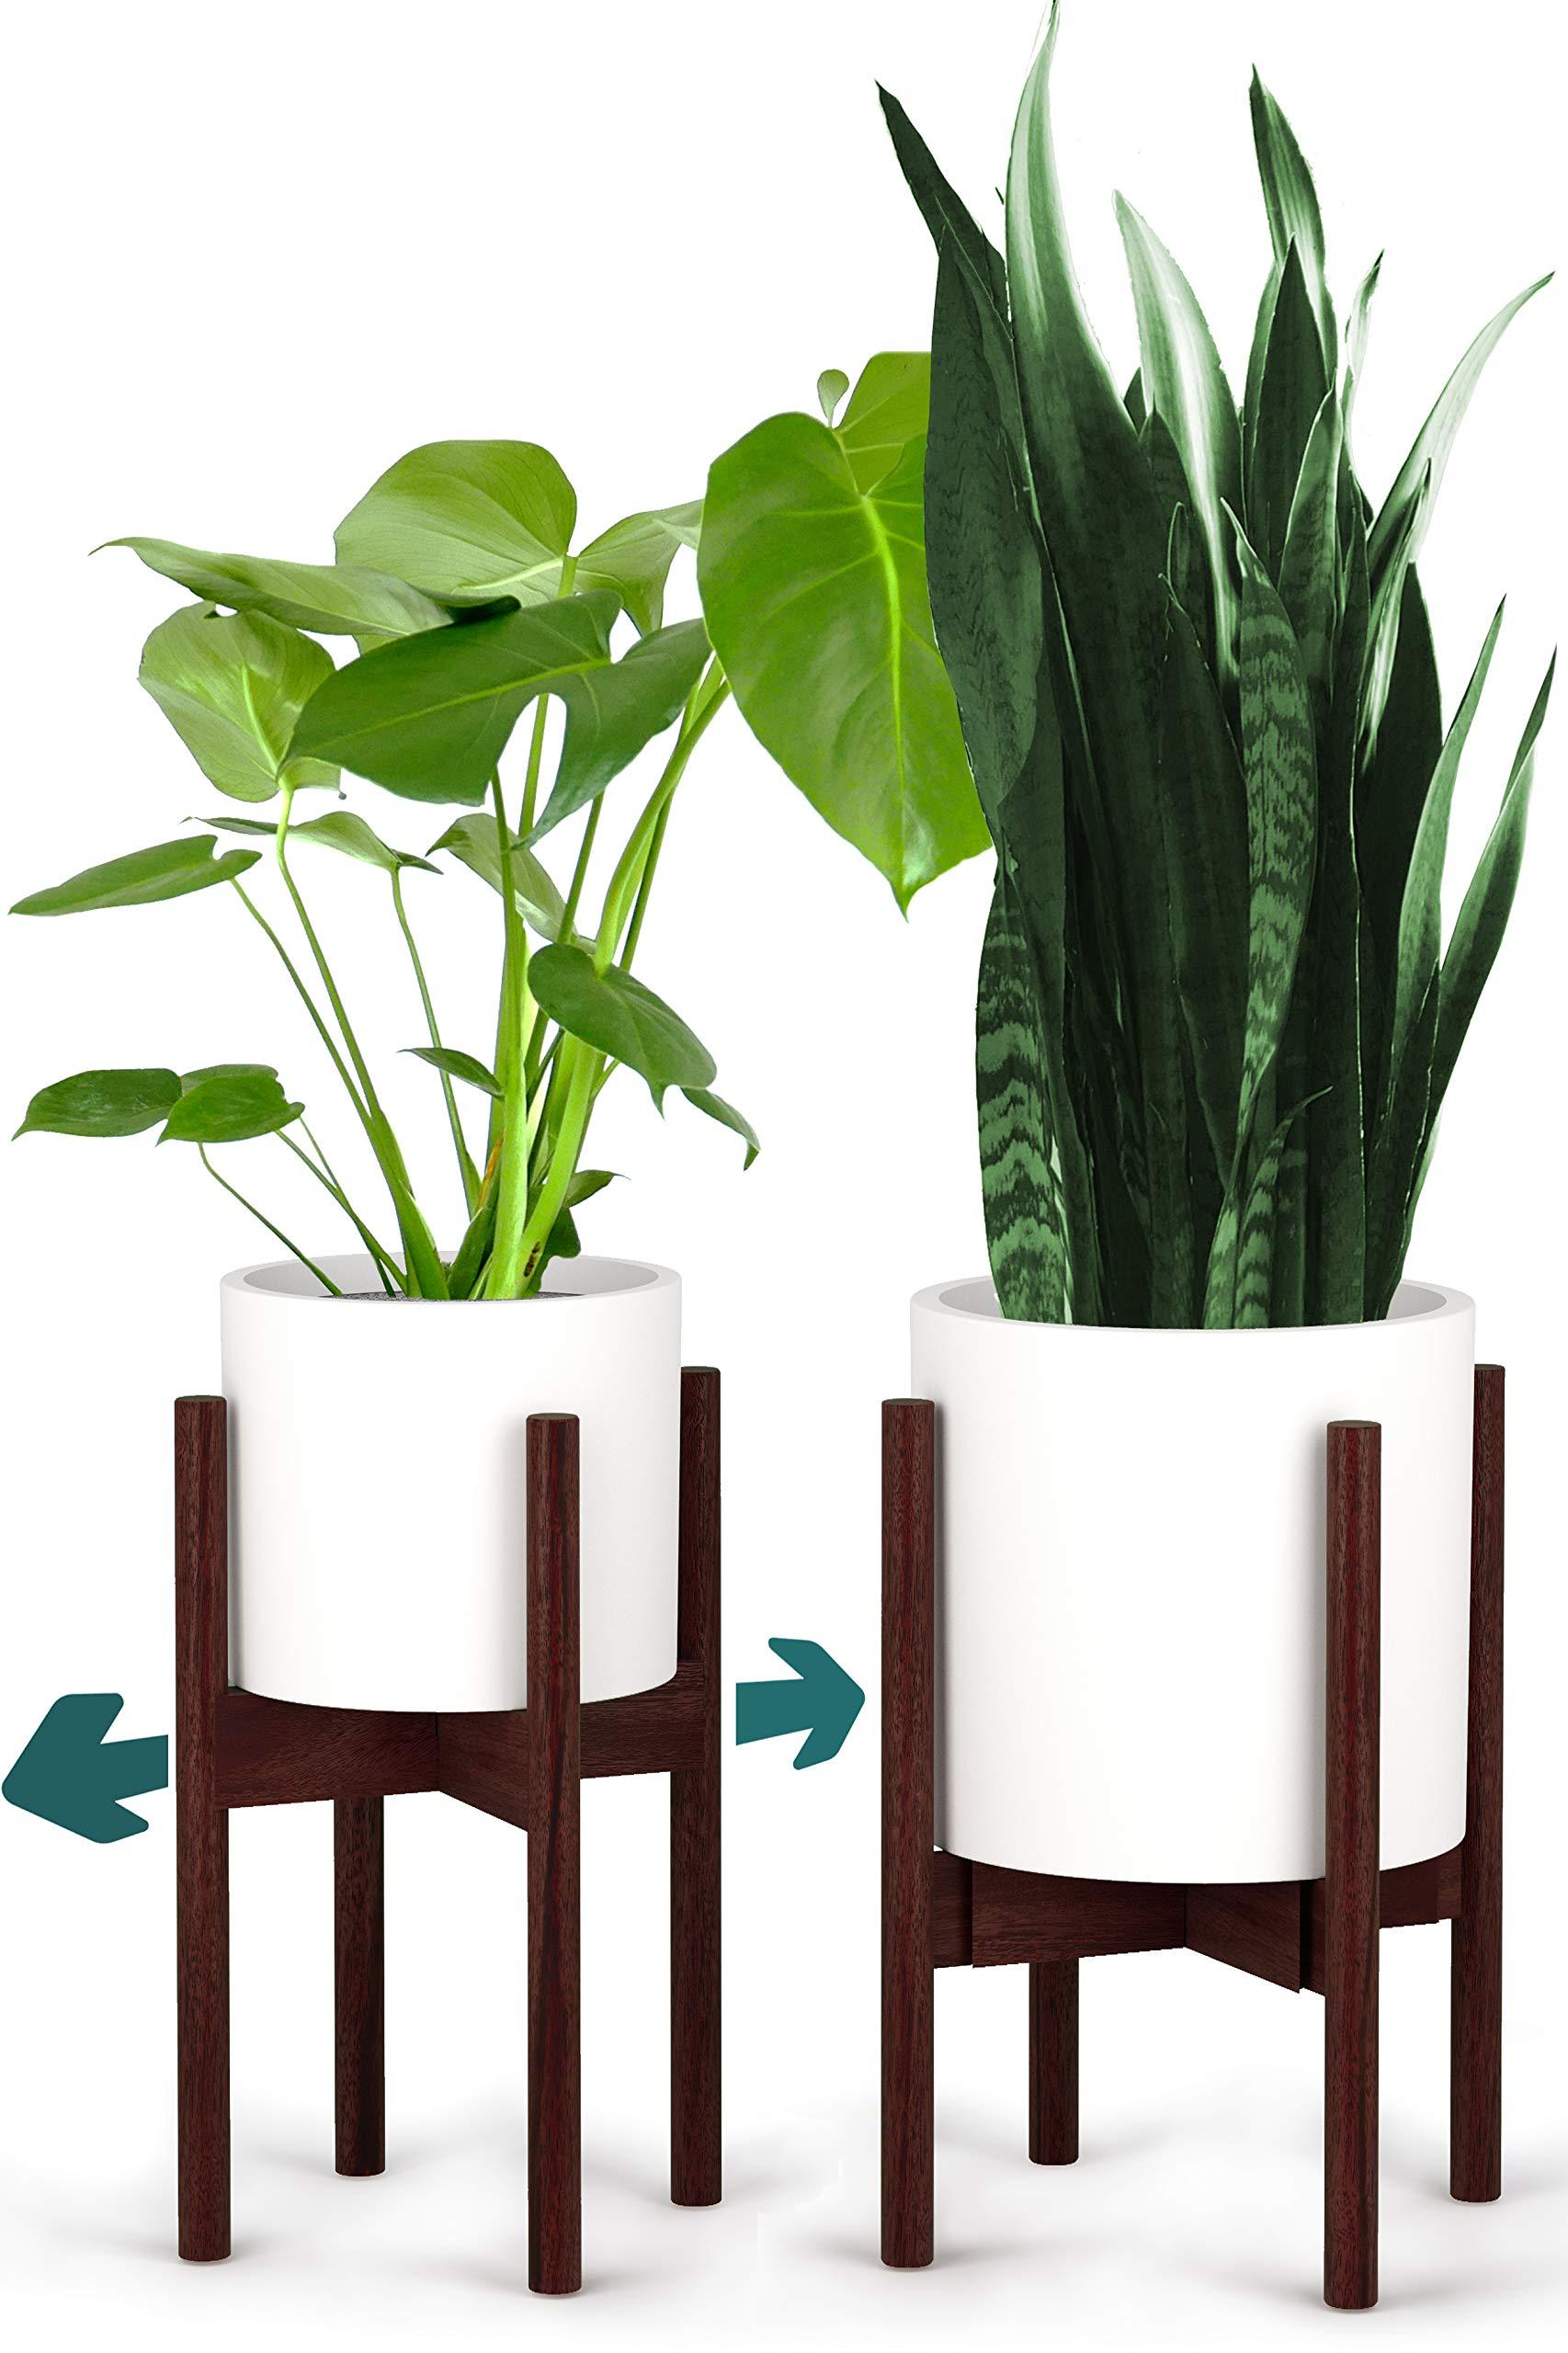 Fox & Fern Indoor Plant Stand - Adjustable Width 8'' up to 12'' - Dark Walnut - EXCLUDING Plant Pot by Fox & Fern